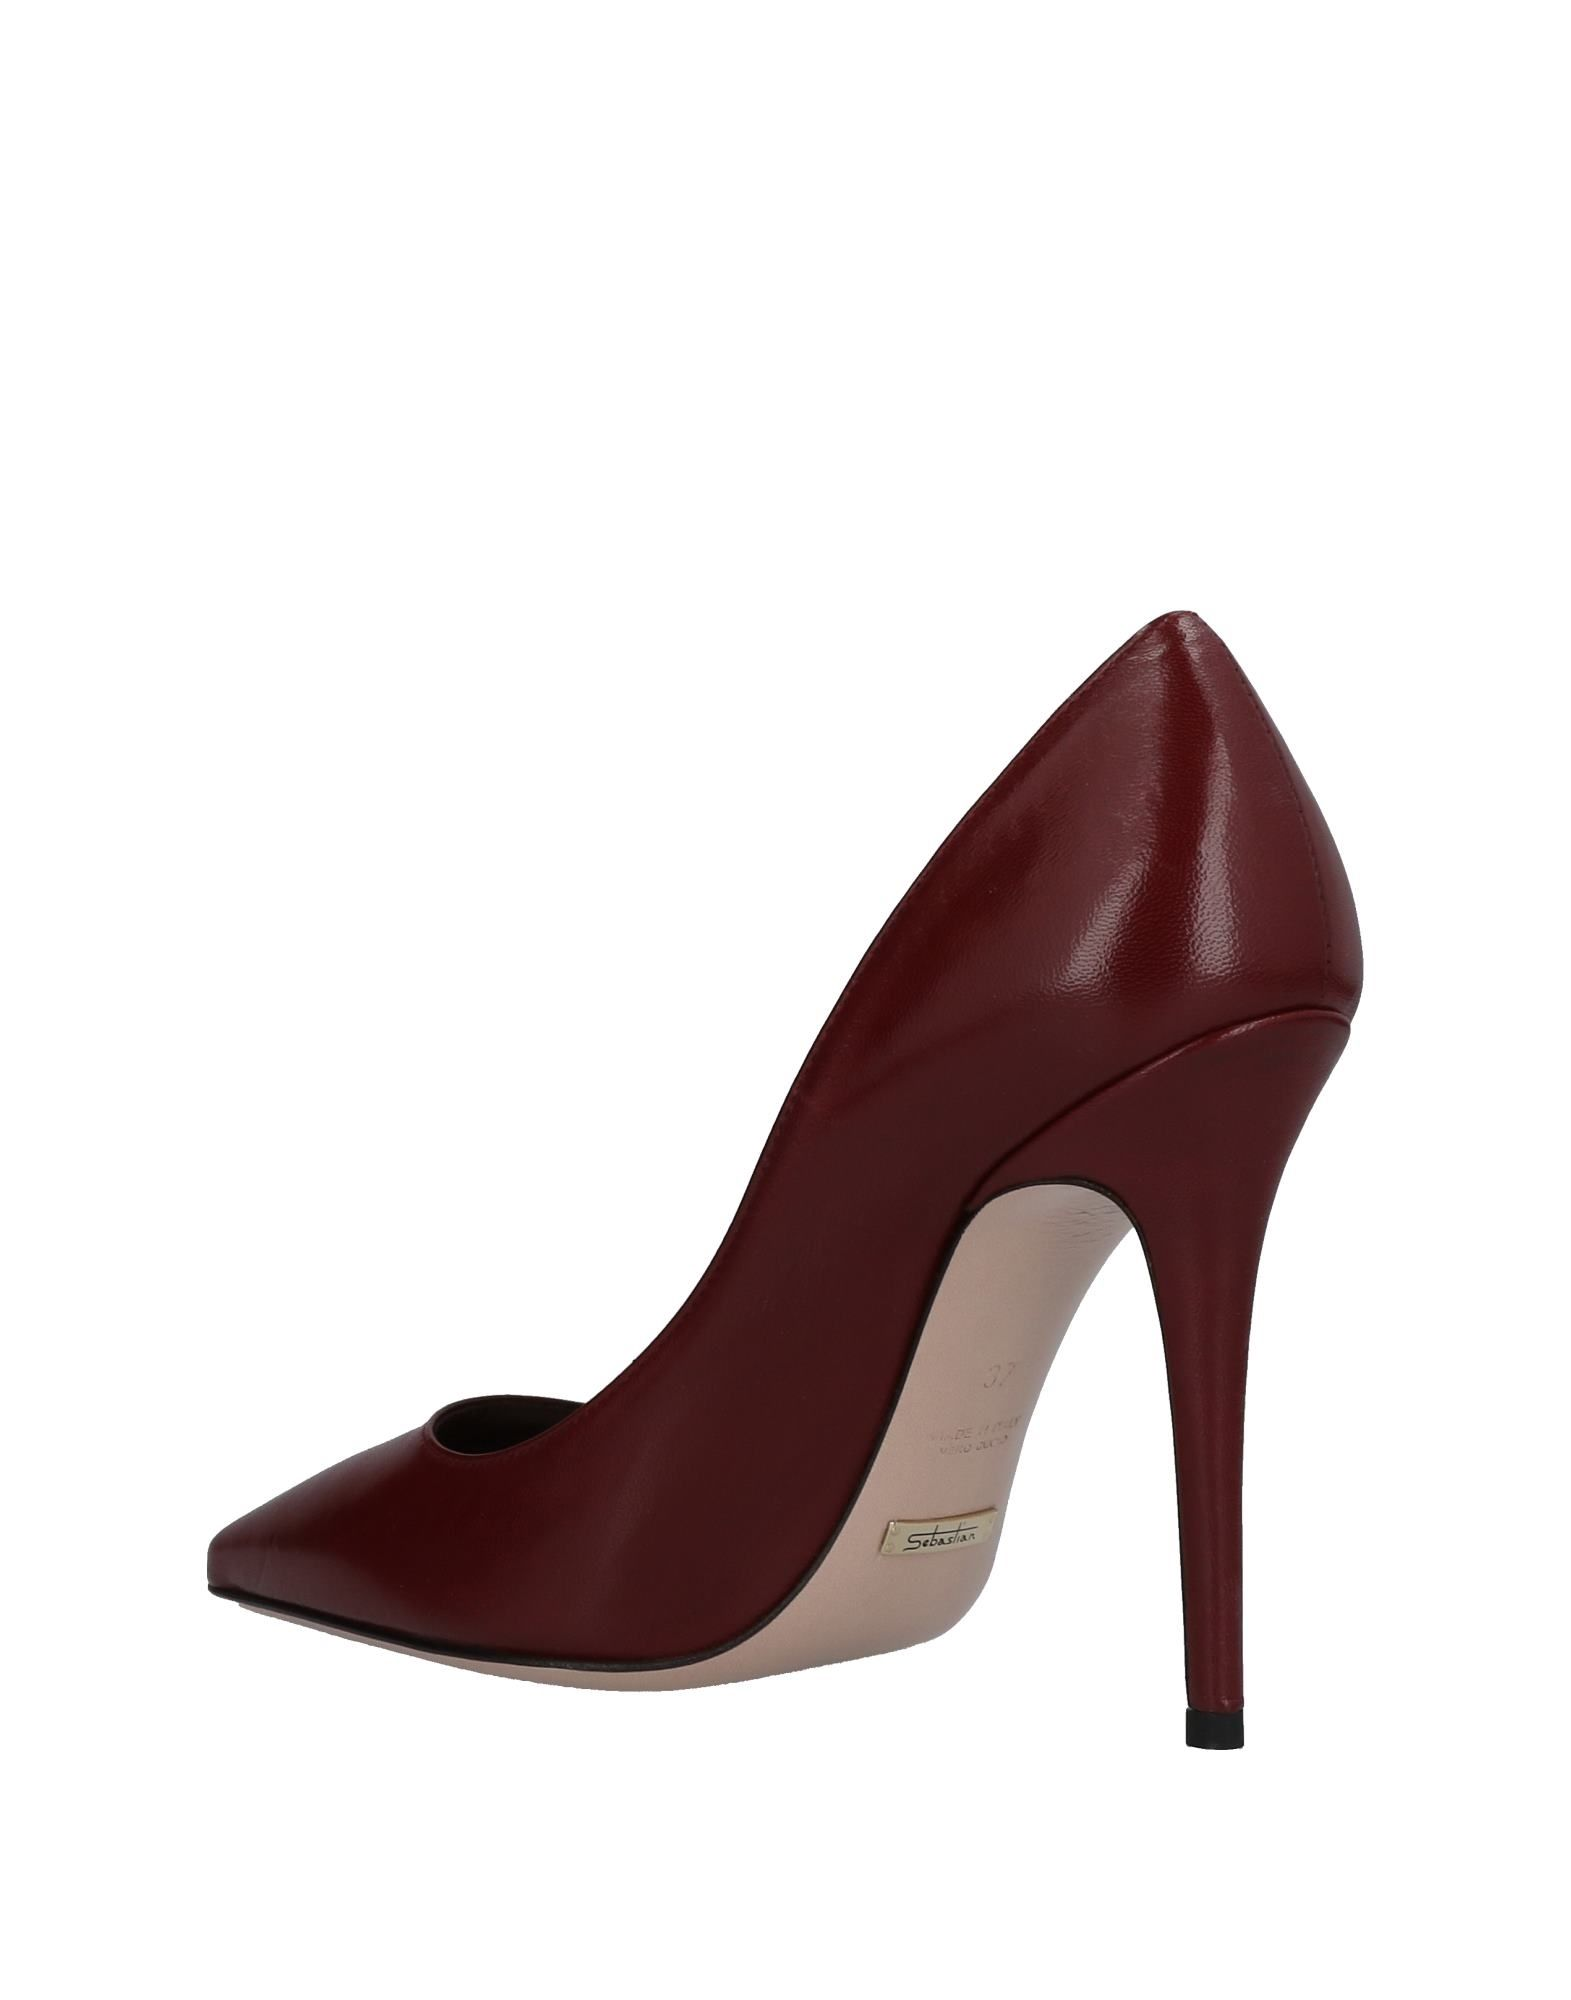 Haltbare Mode billige Schuhe Sebastian Pumps Damen  11445739MH 11445739MH 11445739MH Heiße Schuhe afcdb2